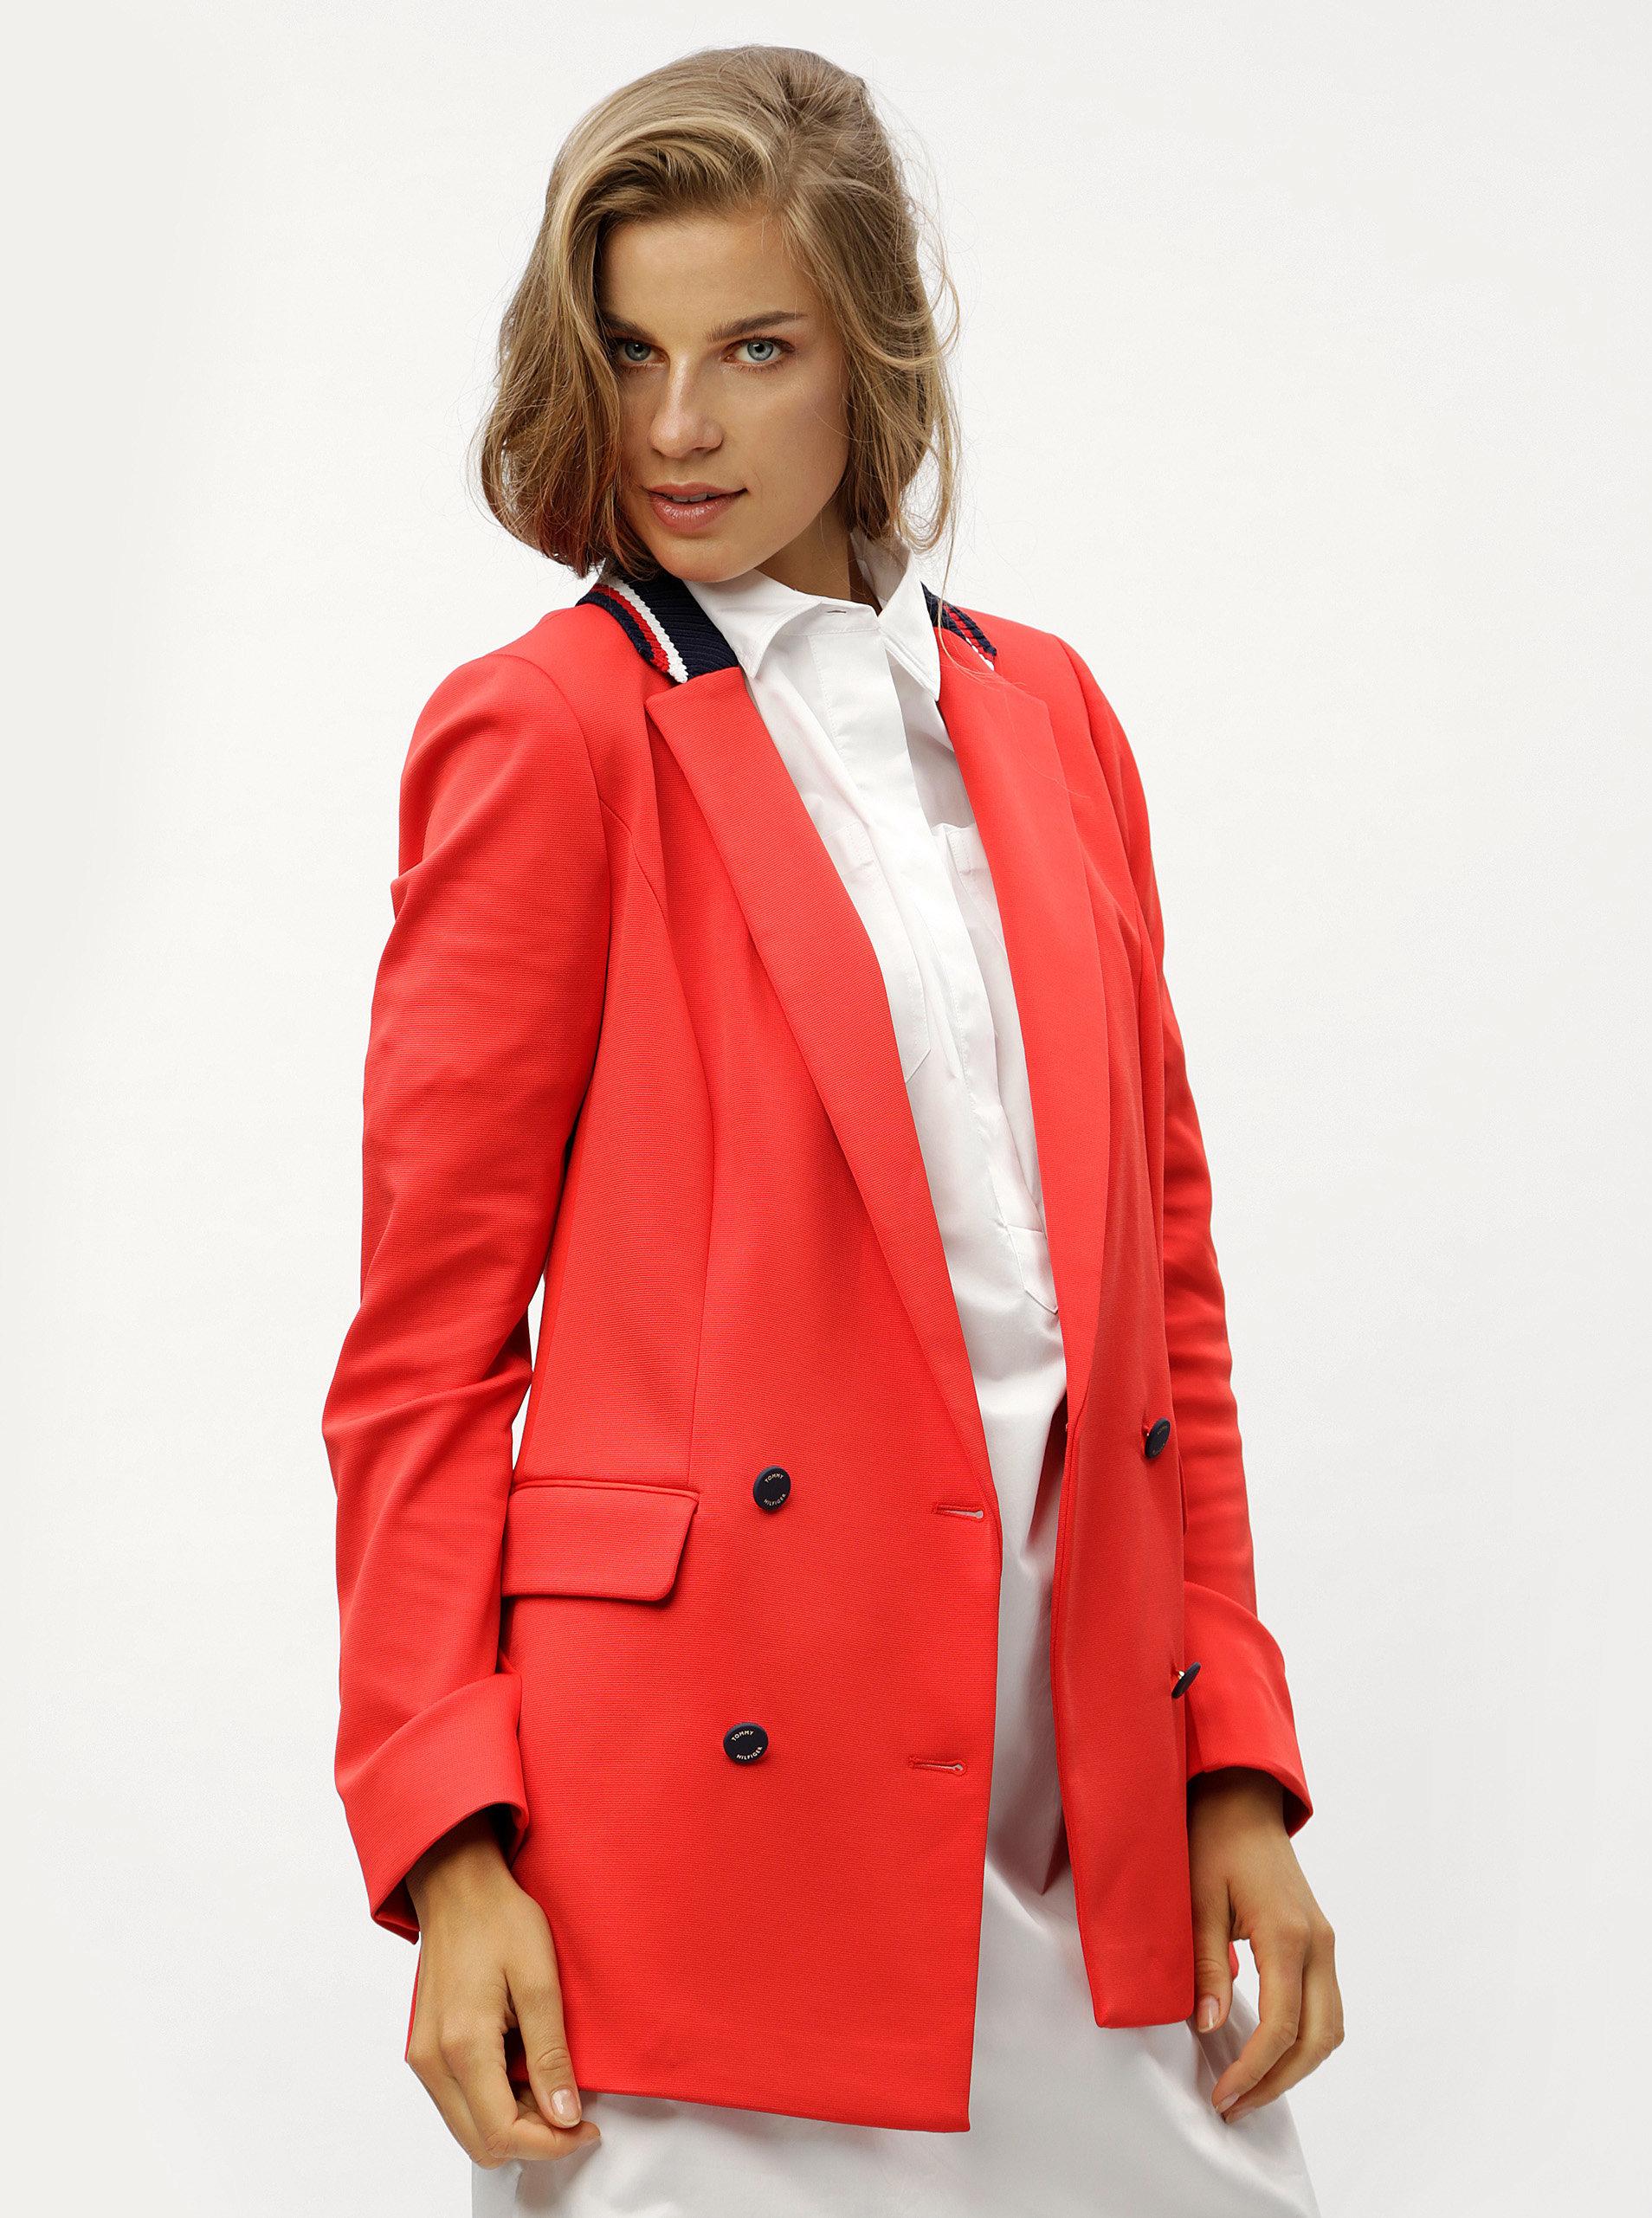 Červené dámské sako Tommy Hilfiger ... eba6738d4a